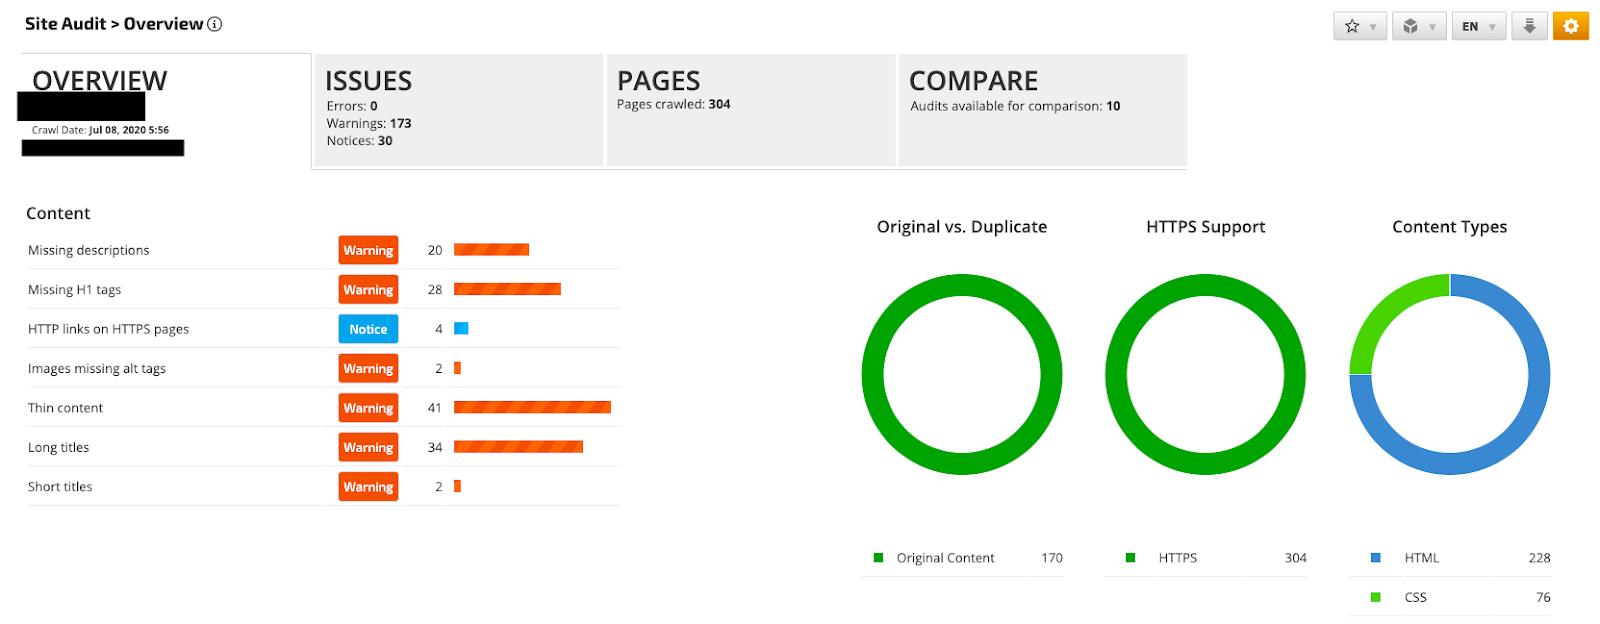 Ran Ranger's site audit tool